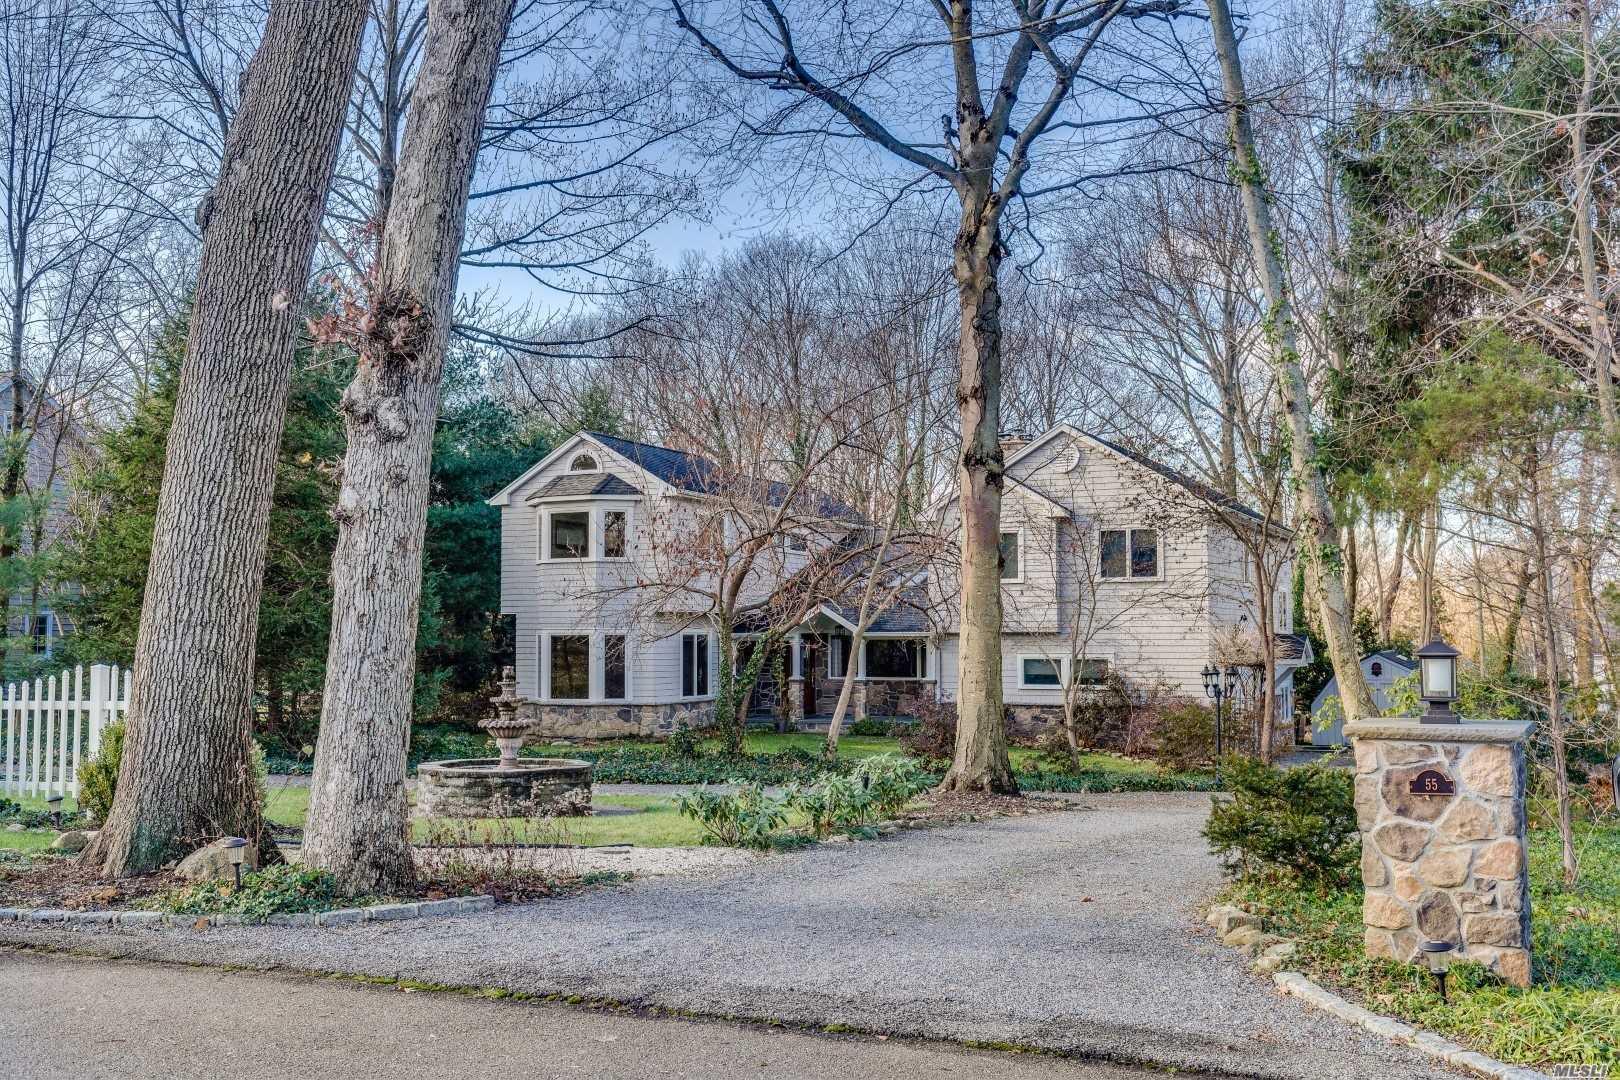 55 Hawxhurst Rd Cold Spring Hrbr, NY 11724